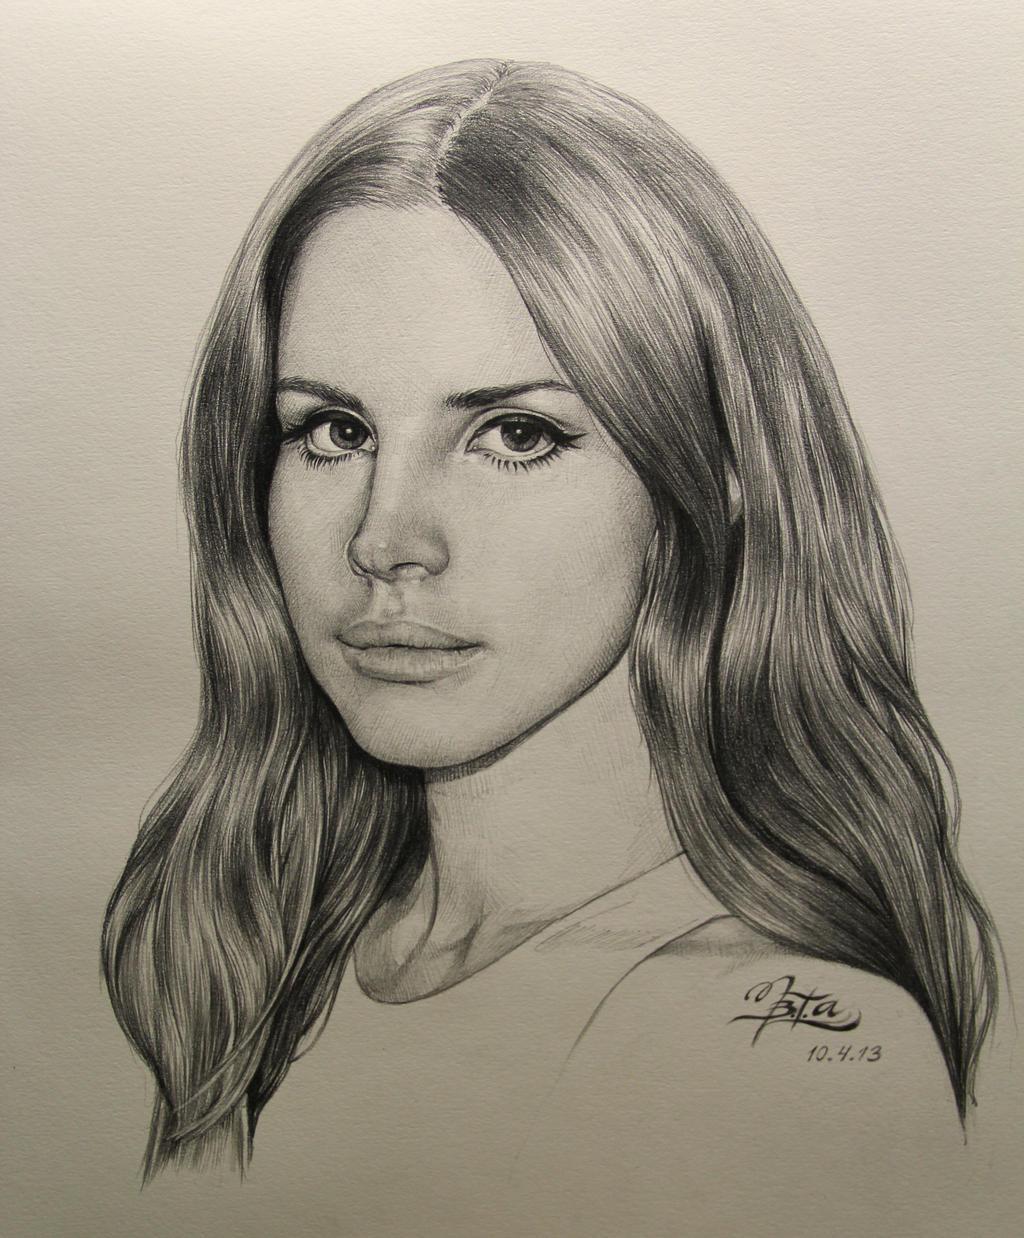 Lana Del Rey by chingybta on DeviantArt